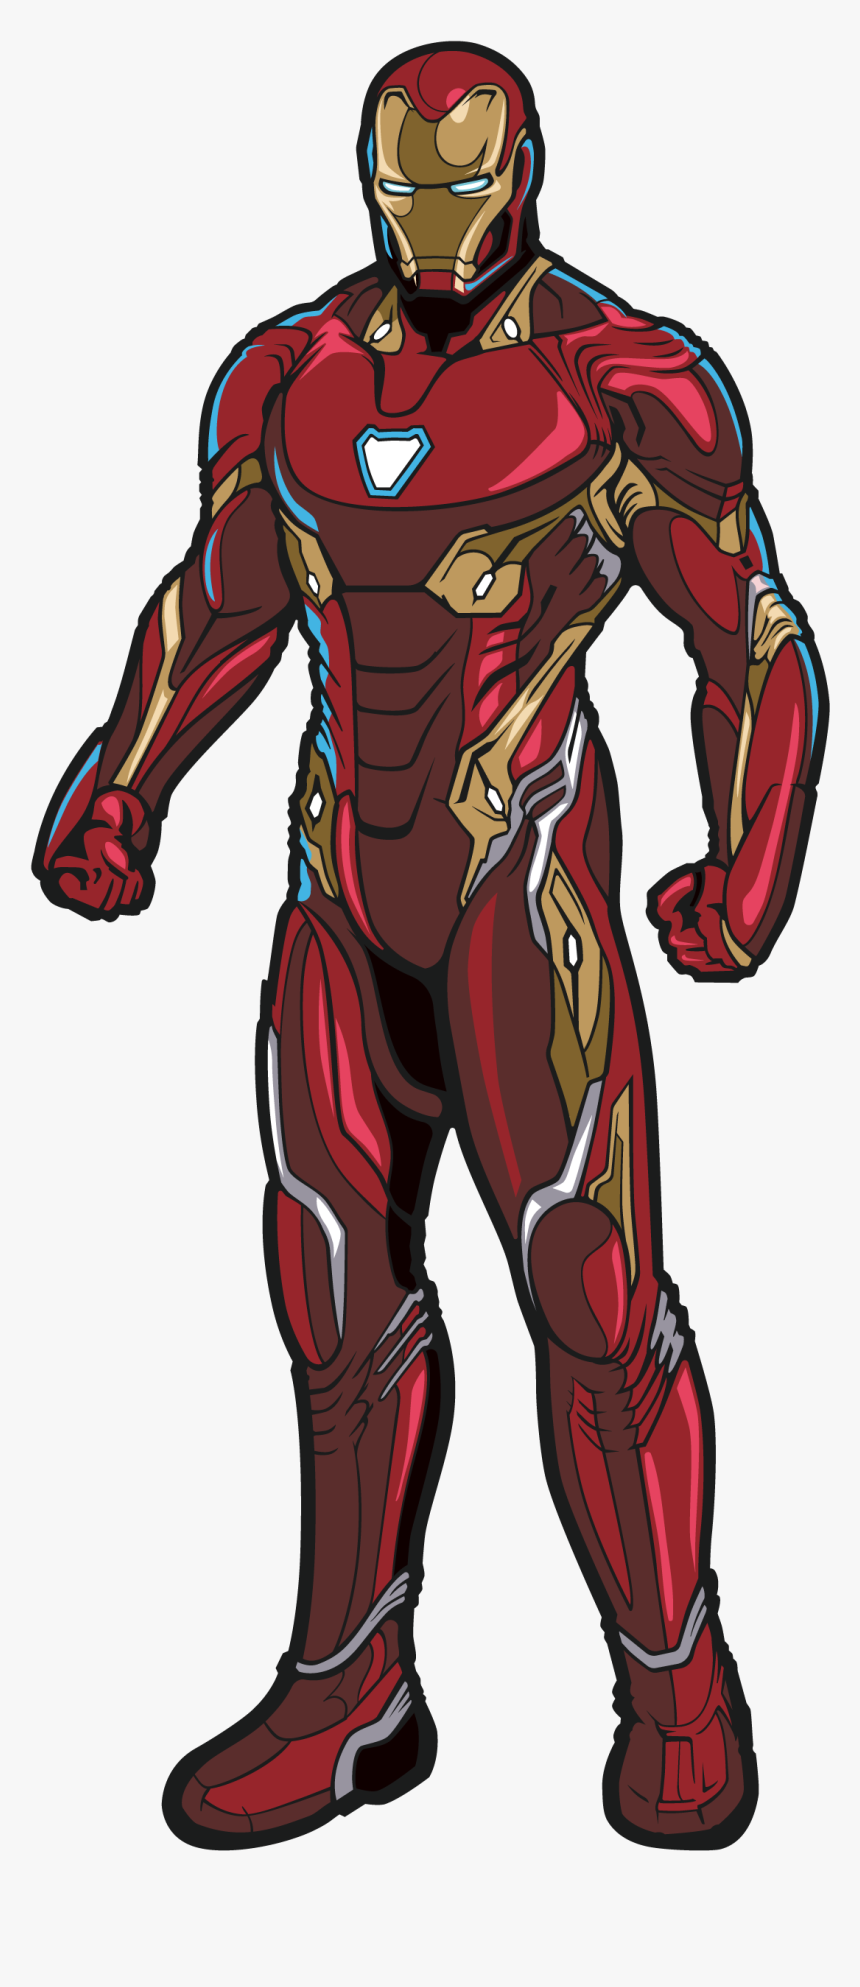 Infinity War Iron Man Drawing, HD Png Download, Free Download